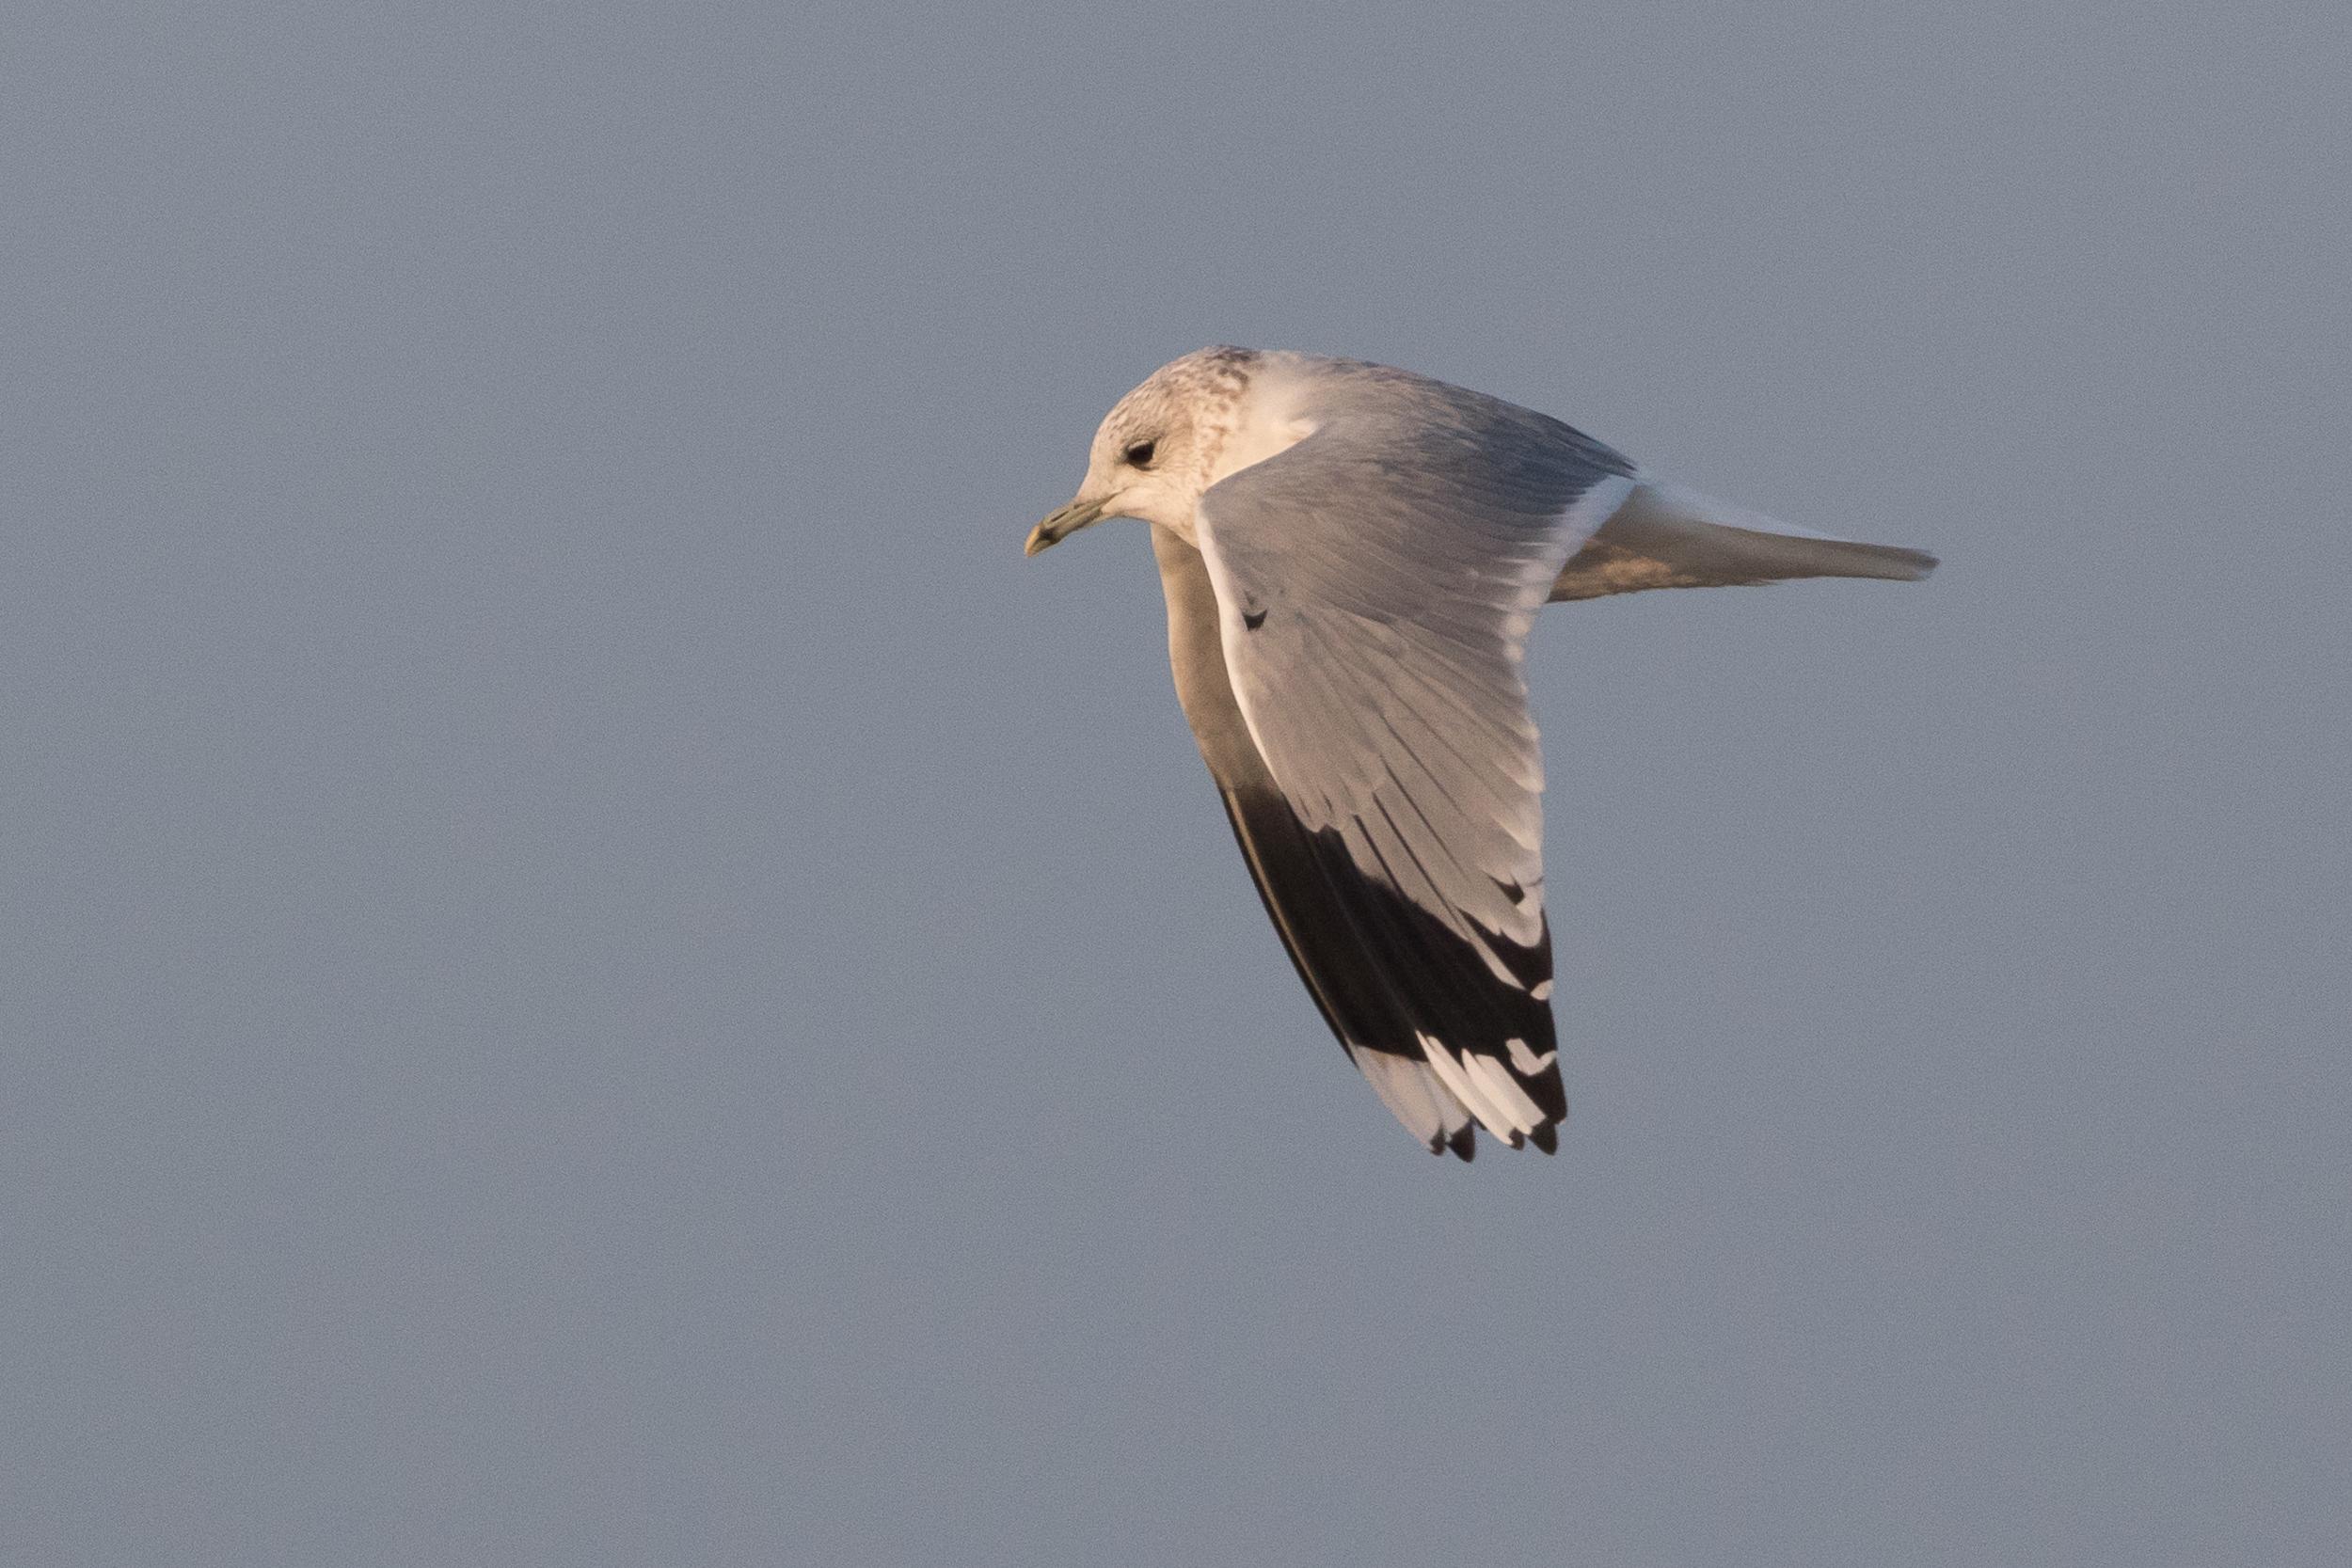 20170126-Common Gull Adult-130.jpg